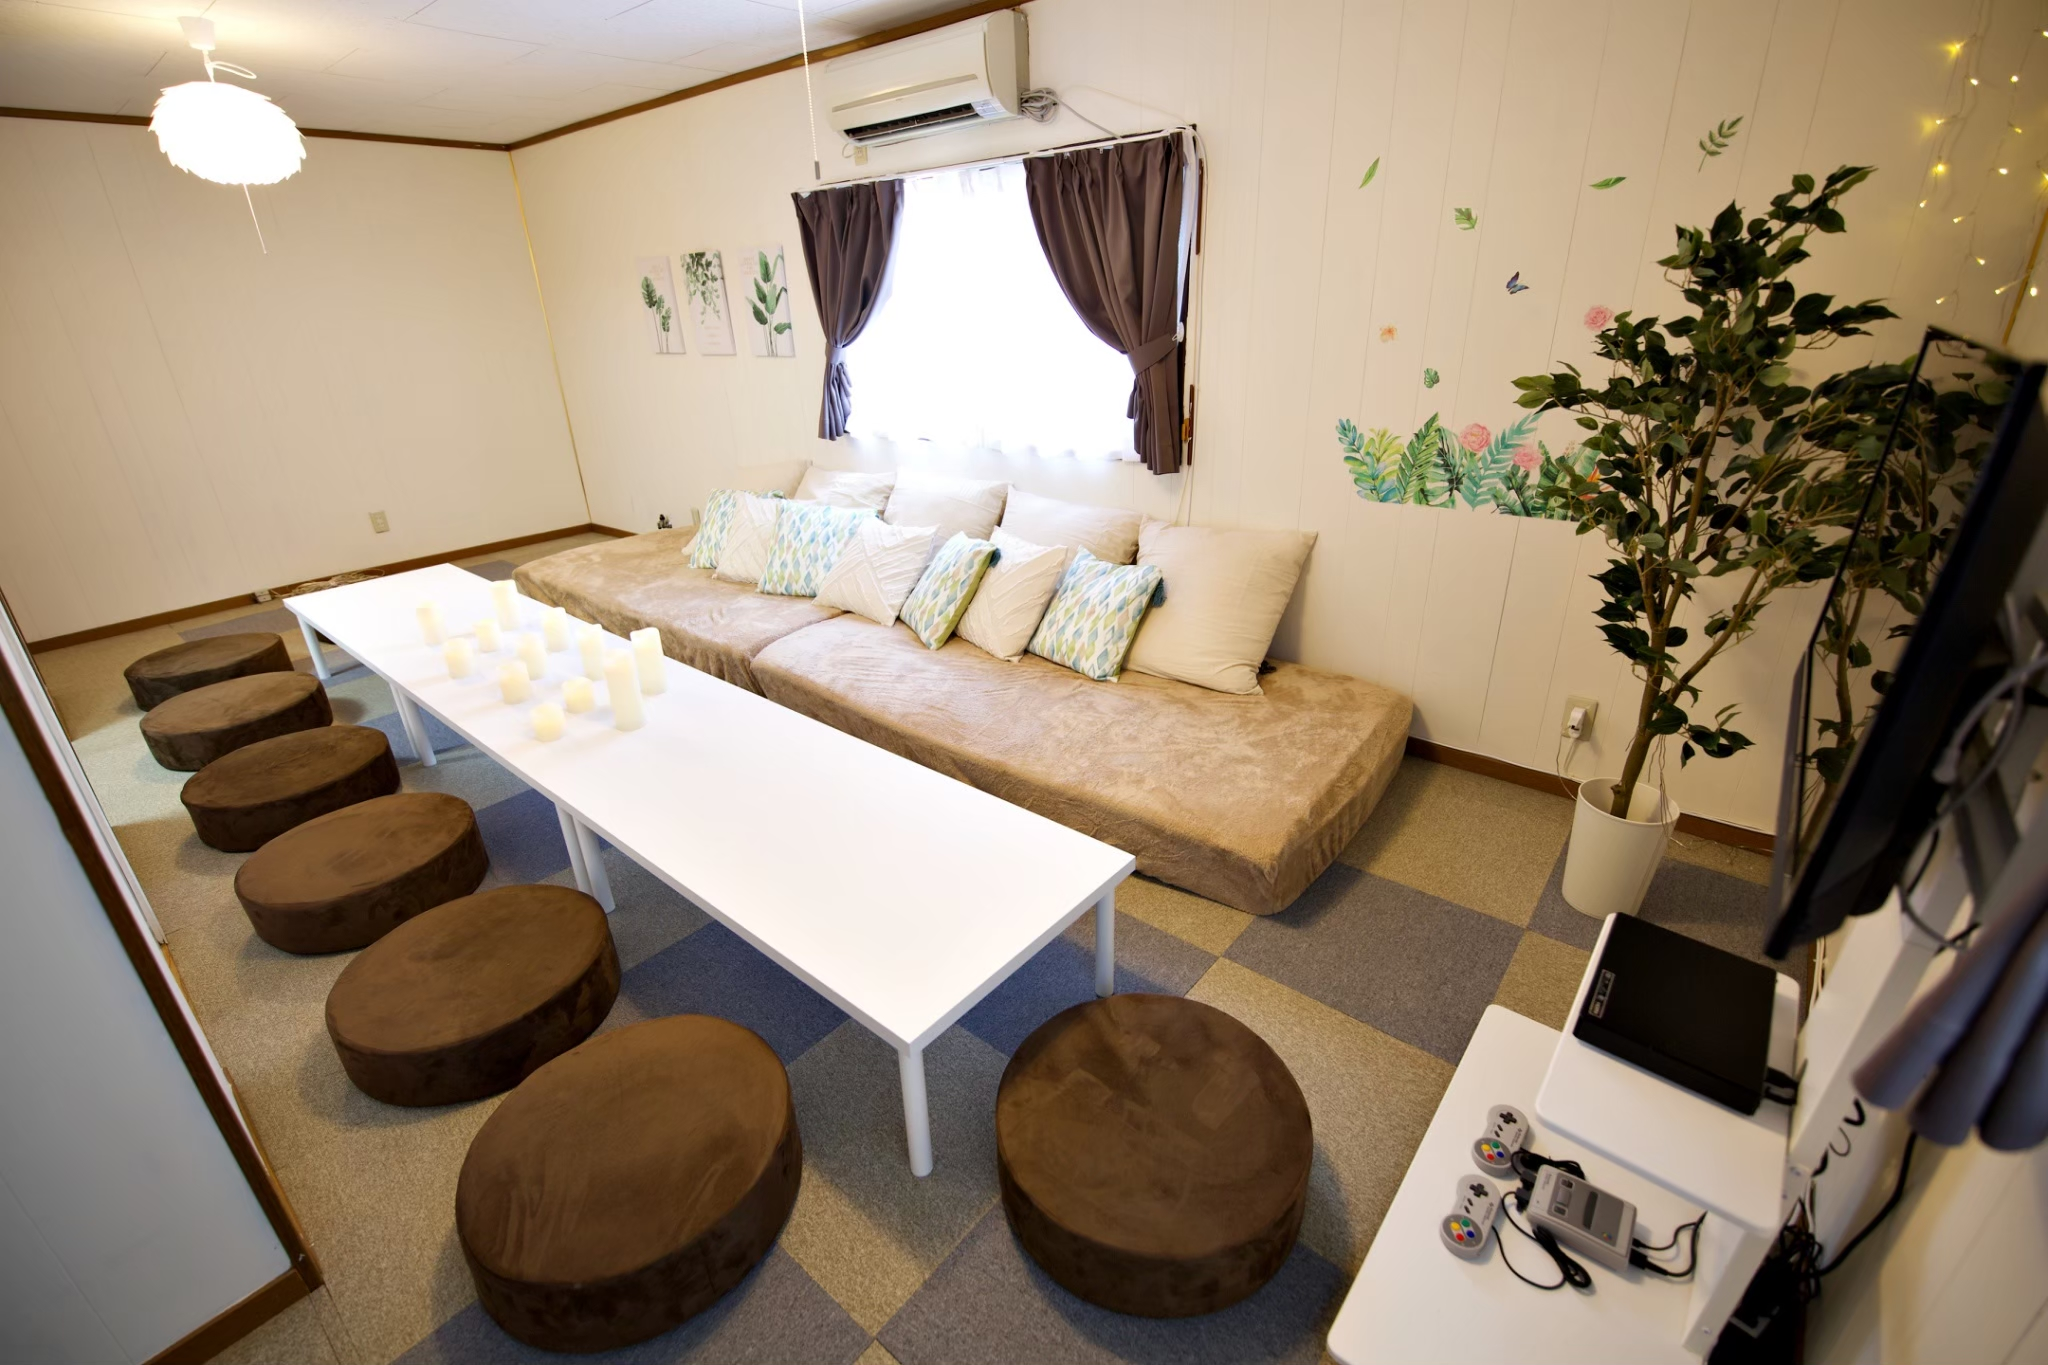 SP124 SHIBUYA SP124 シェアスペの室内の写真